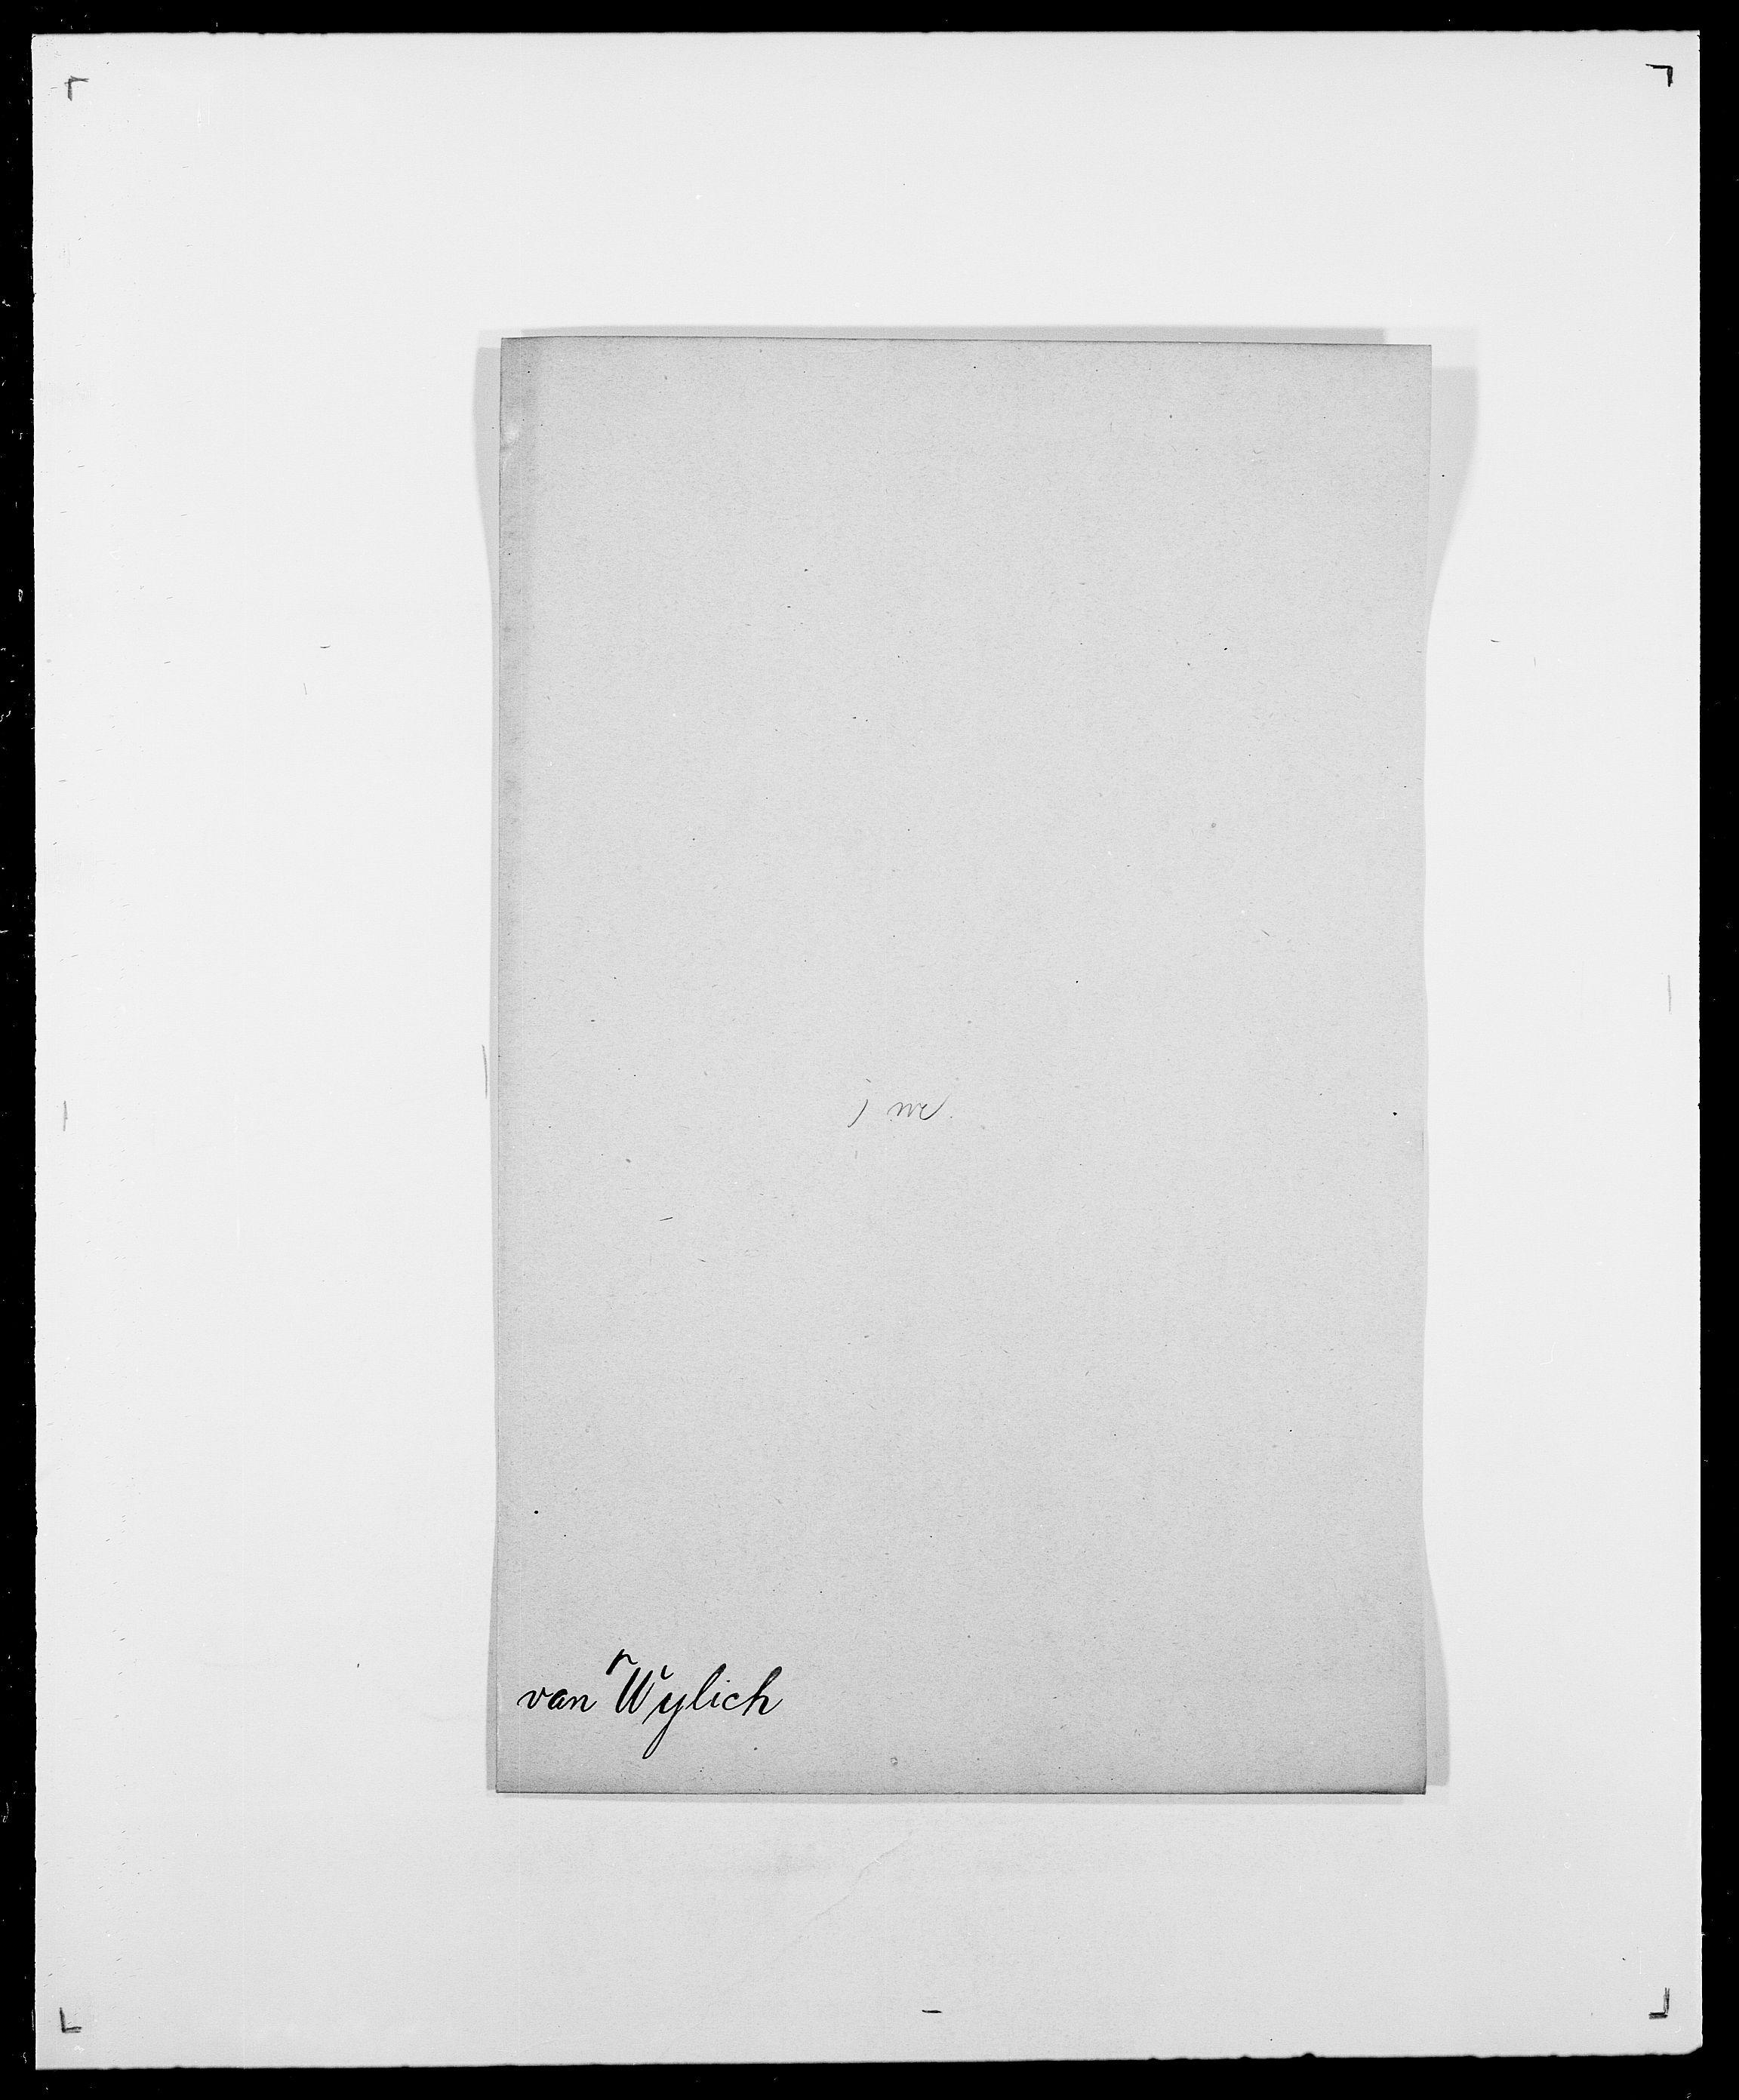 SAO, Delgobe, Charles Antoine - samling, D/Da/L0043: Wulfsberg - v. Zanten, s. 16